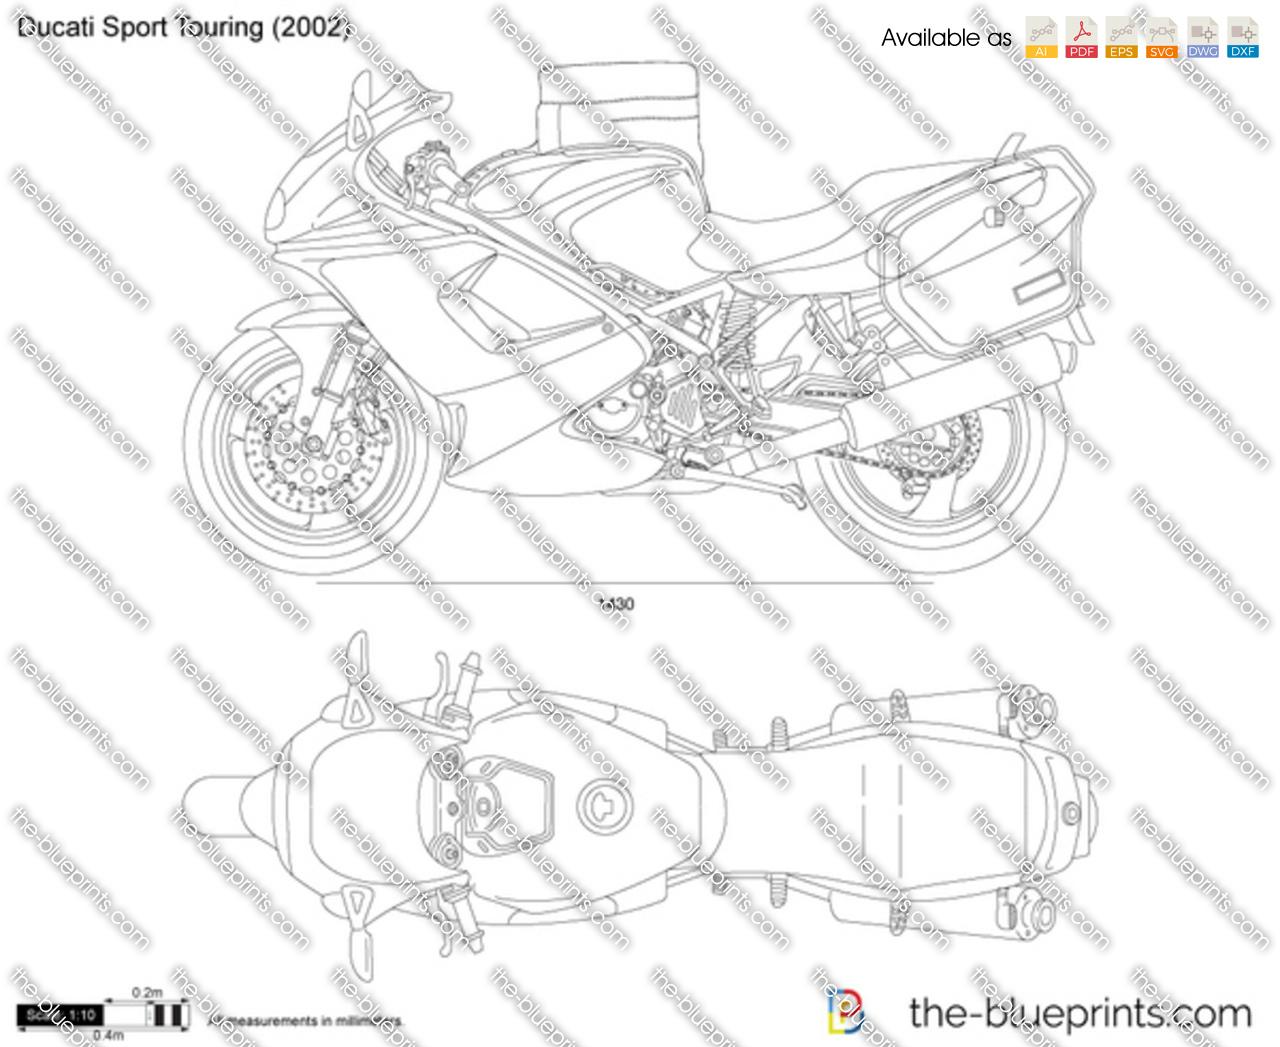 Ducati Sport Touring